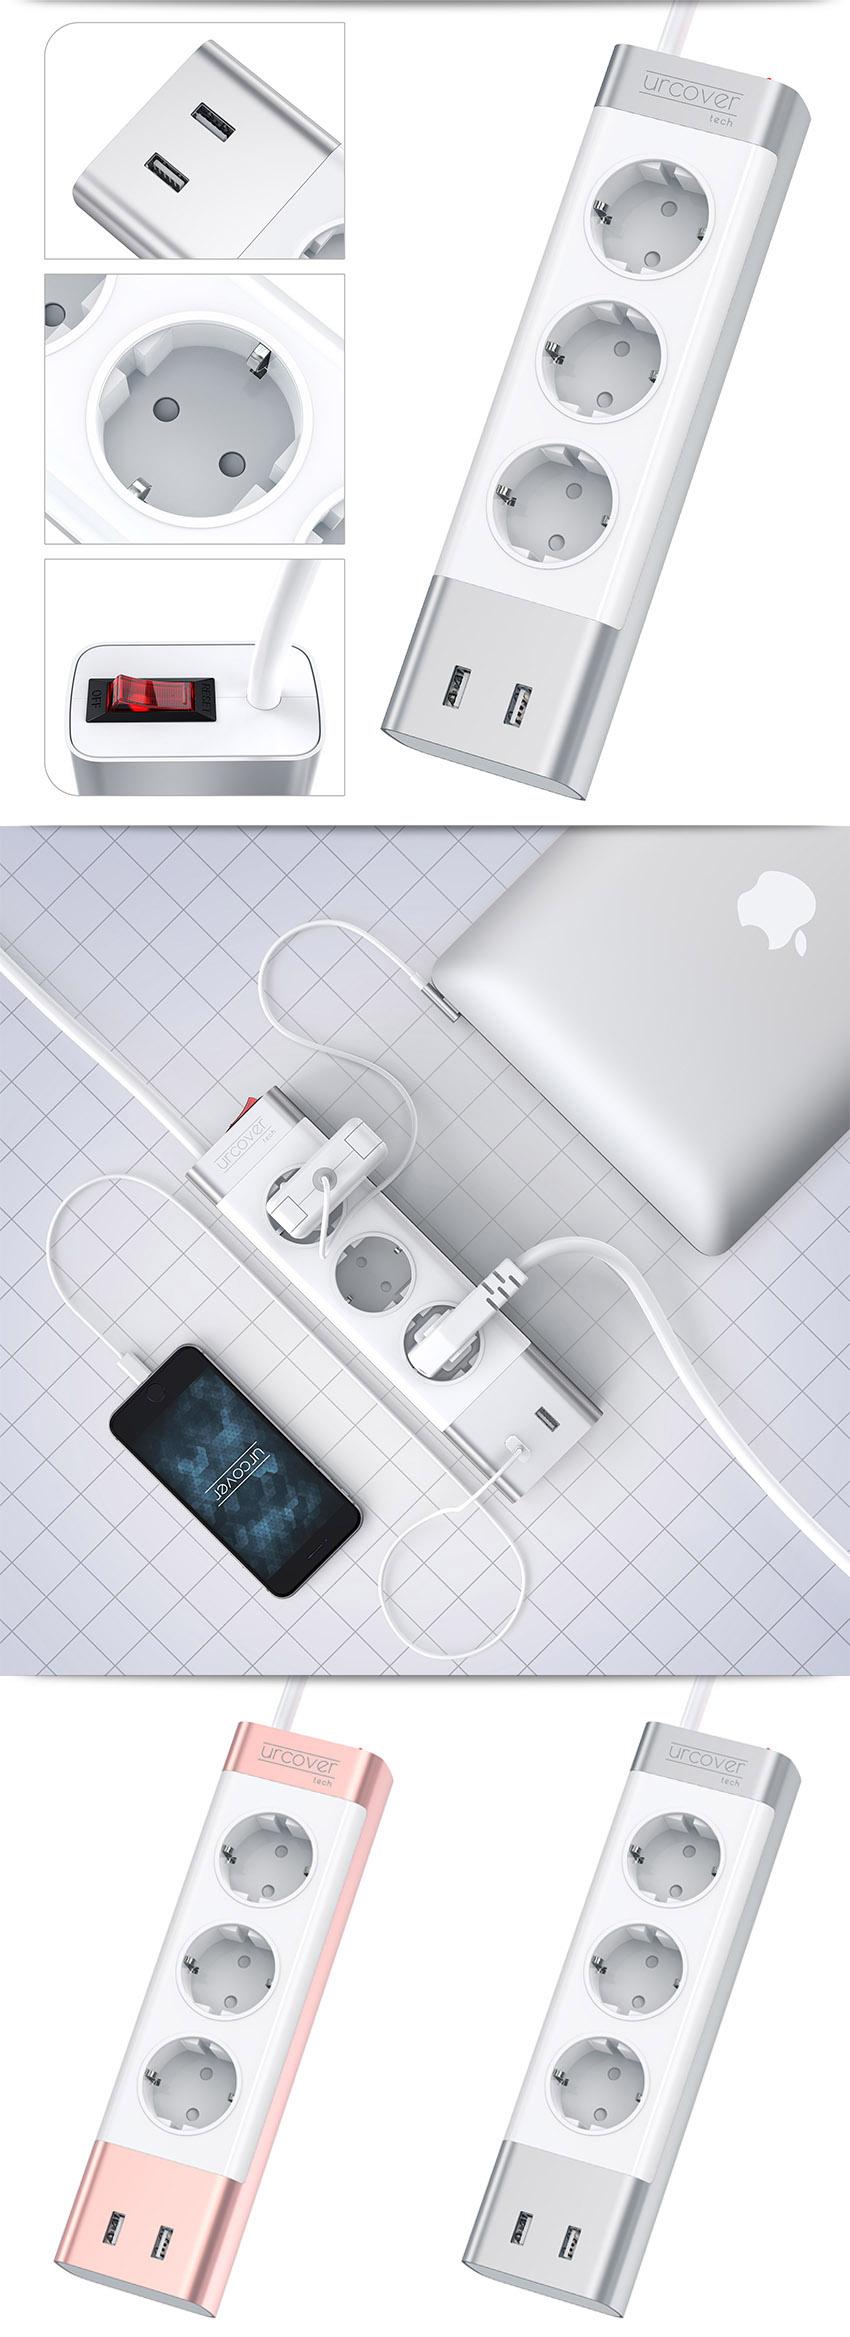 urcover tech steckdosenleiste mit usb anschl ssen steckerleiste mehrfachstecker ebay. Black Bedroom Furniture Sets. Home Design Ideas